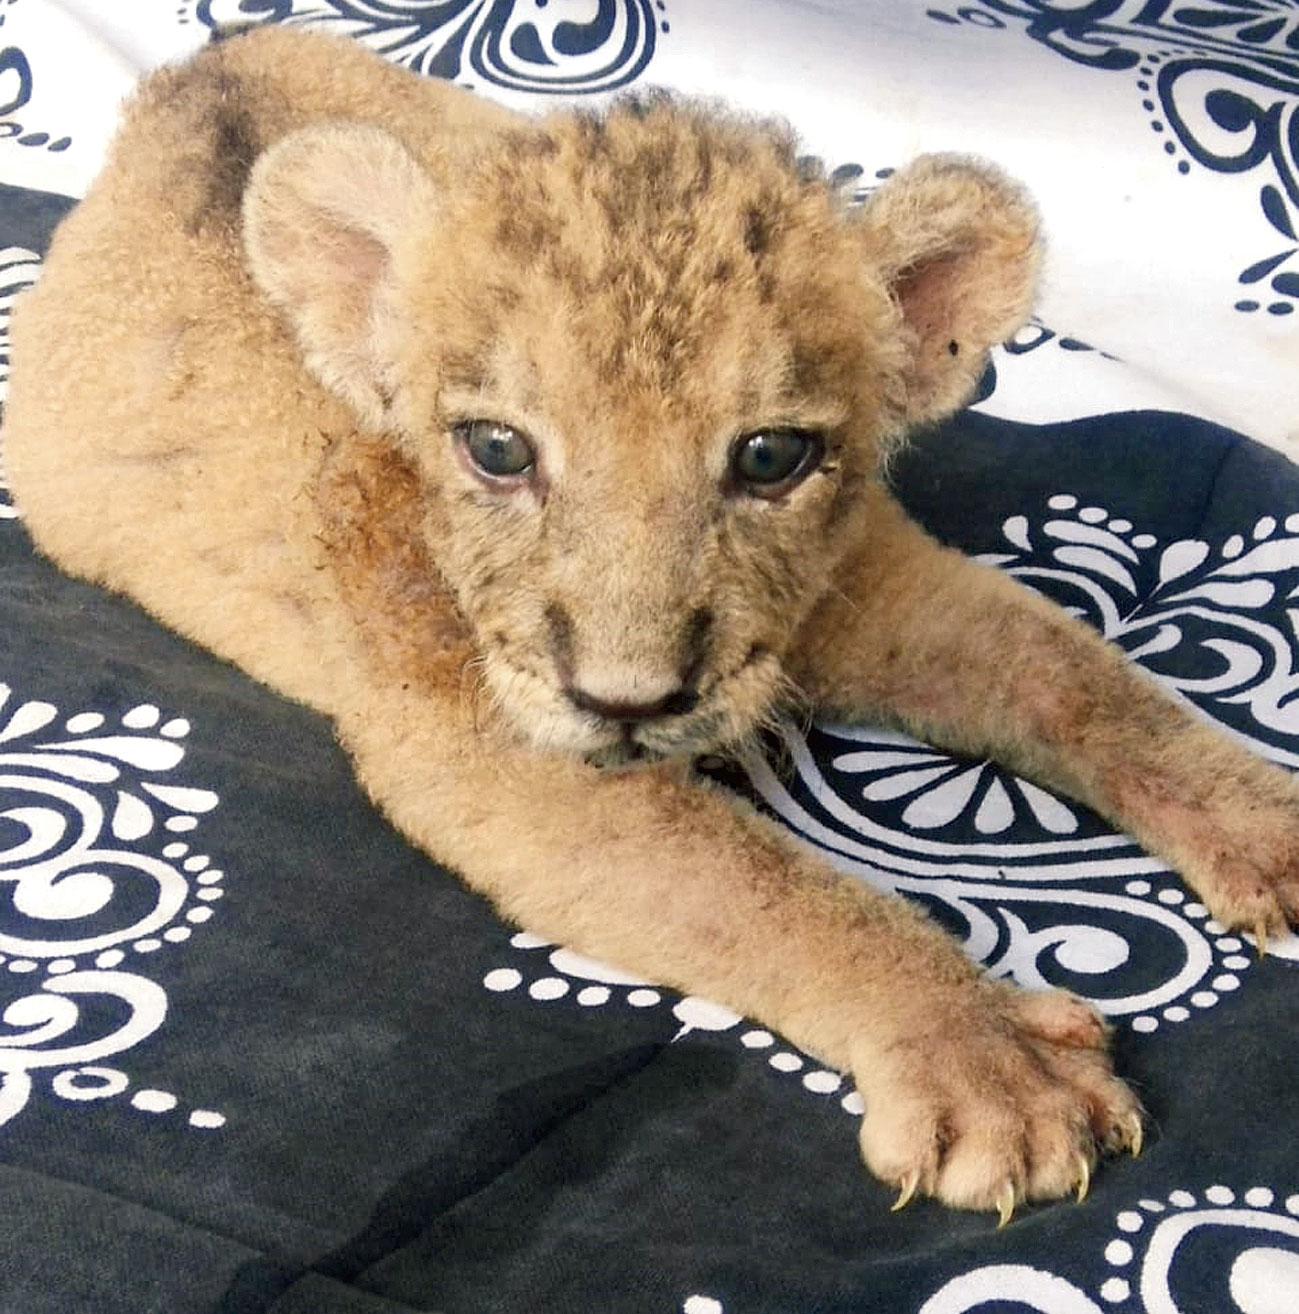 The abandoned cub at Alipore zoo hospital.